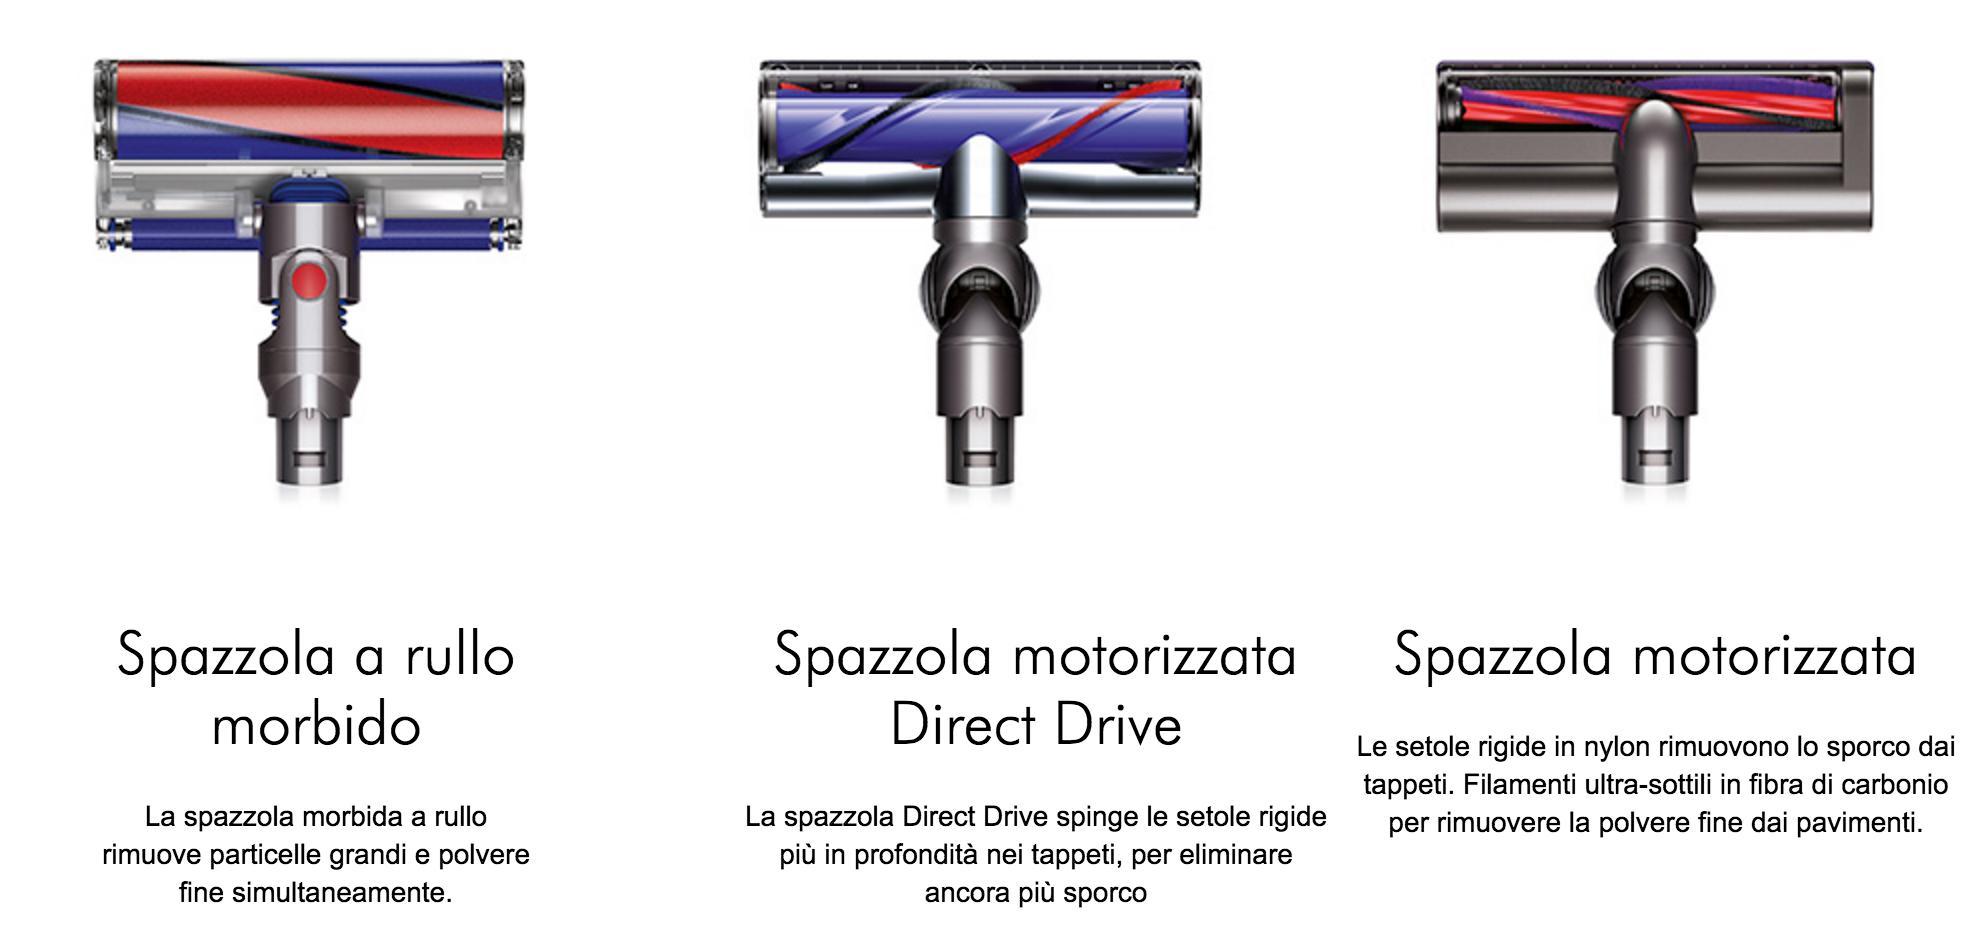 Cs, CAREservice spazzole-dyson Dyson V6 - Spazzola A Rullo Morbido [Cod.966489-01] DC58 DC59 DC61 DC62 Dyson V6 966489-01